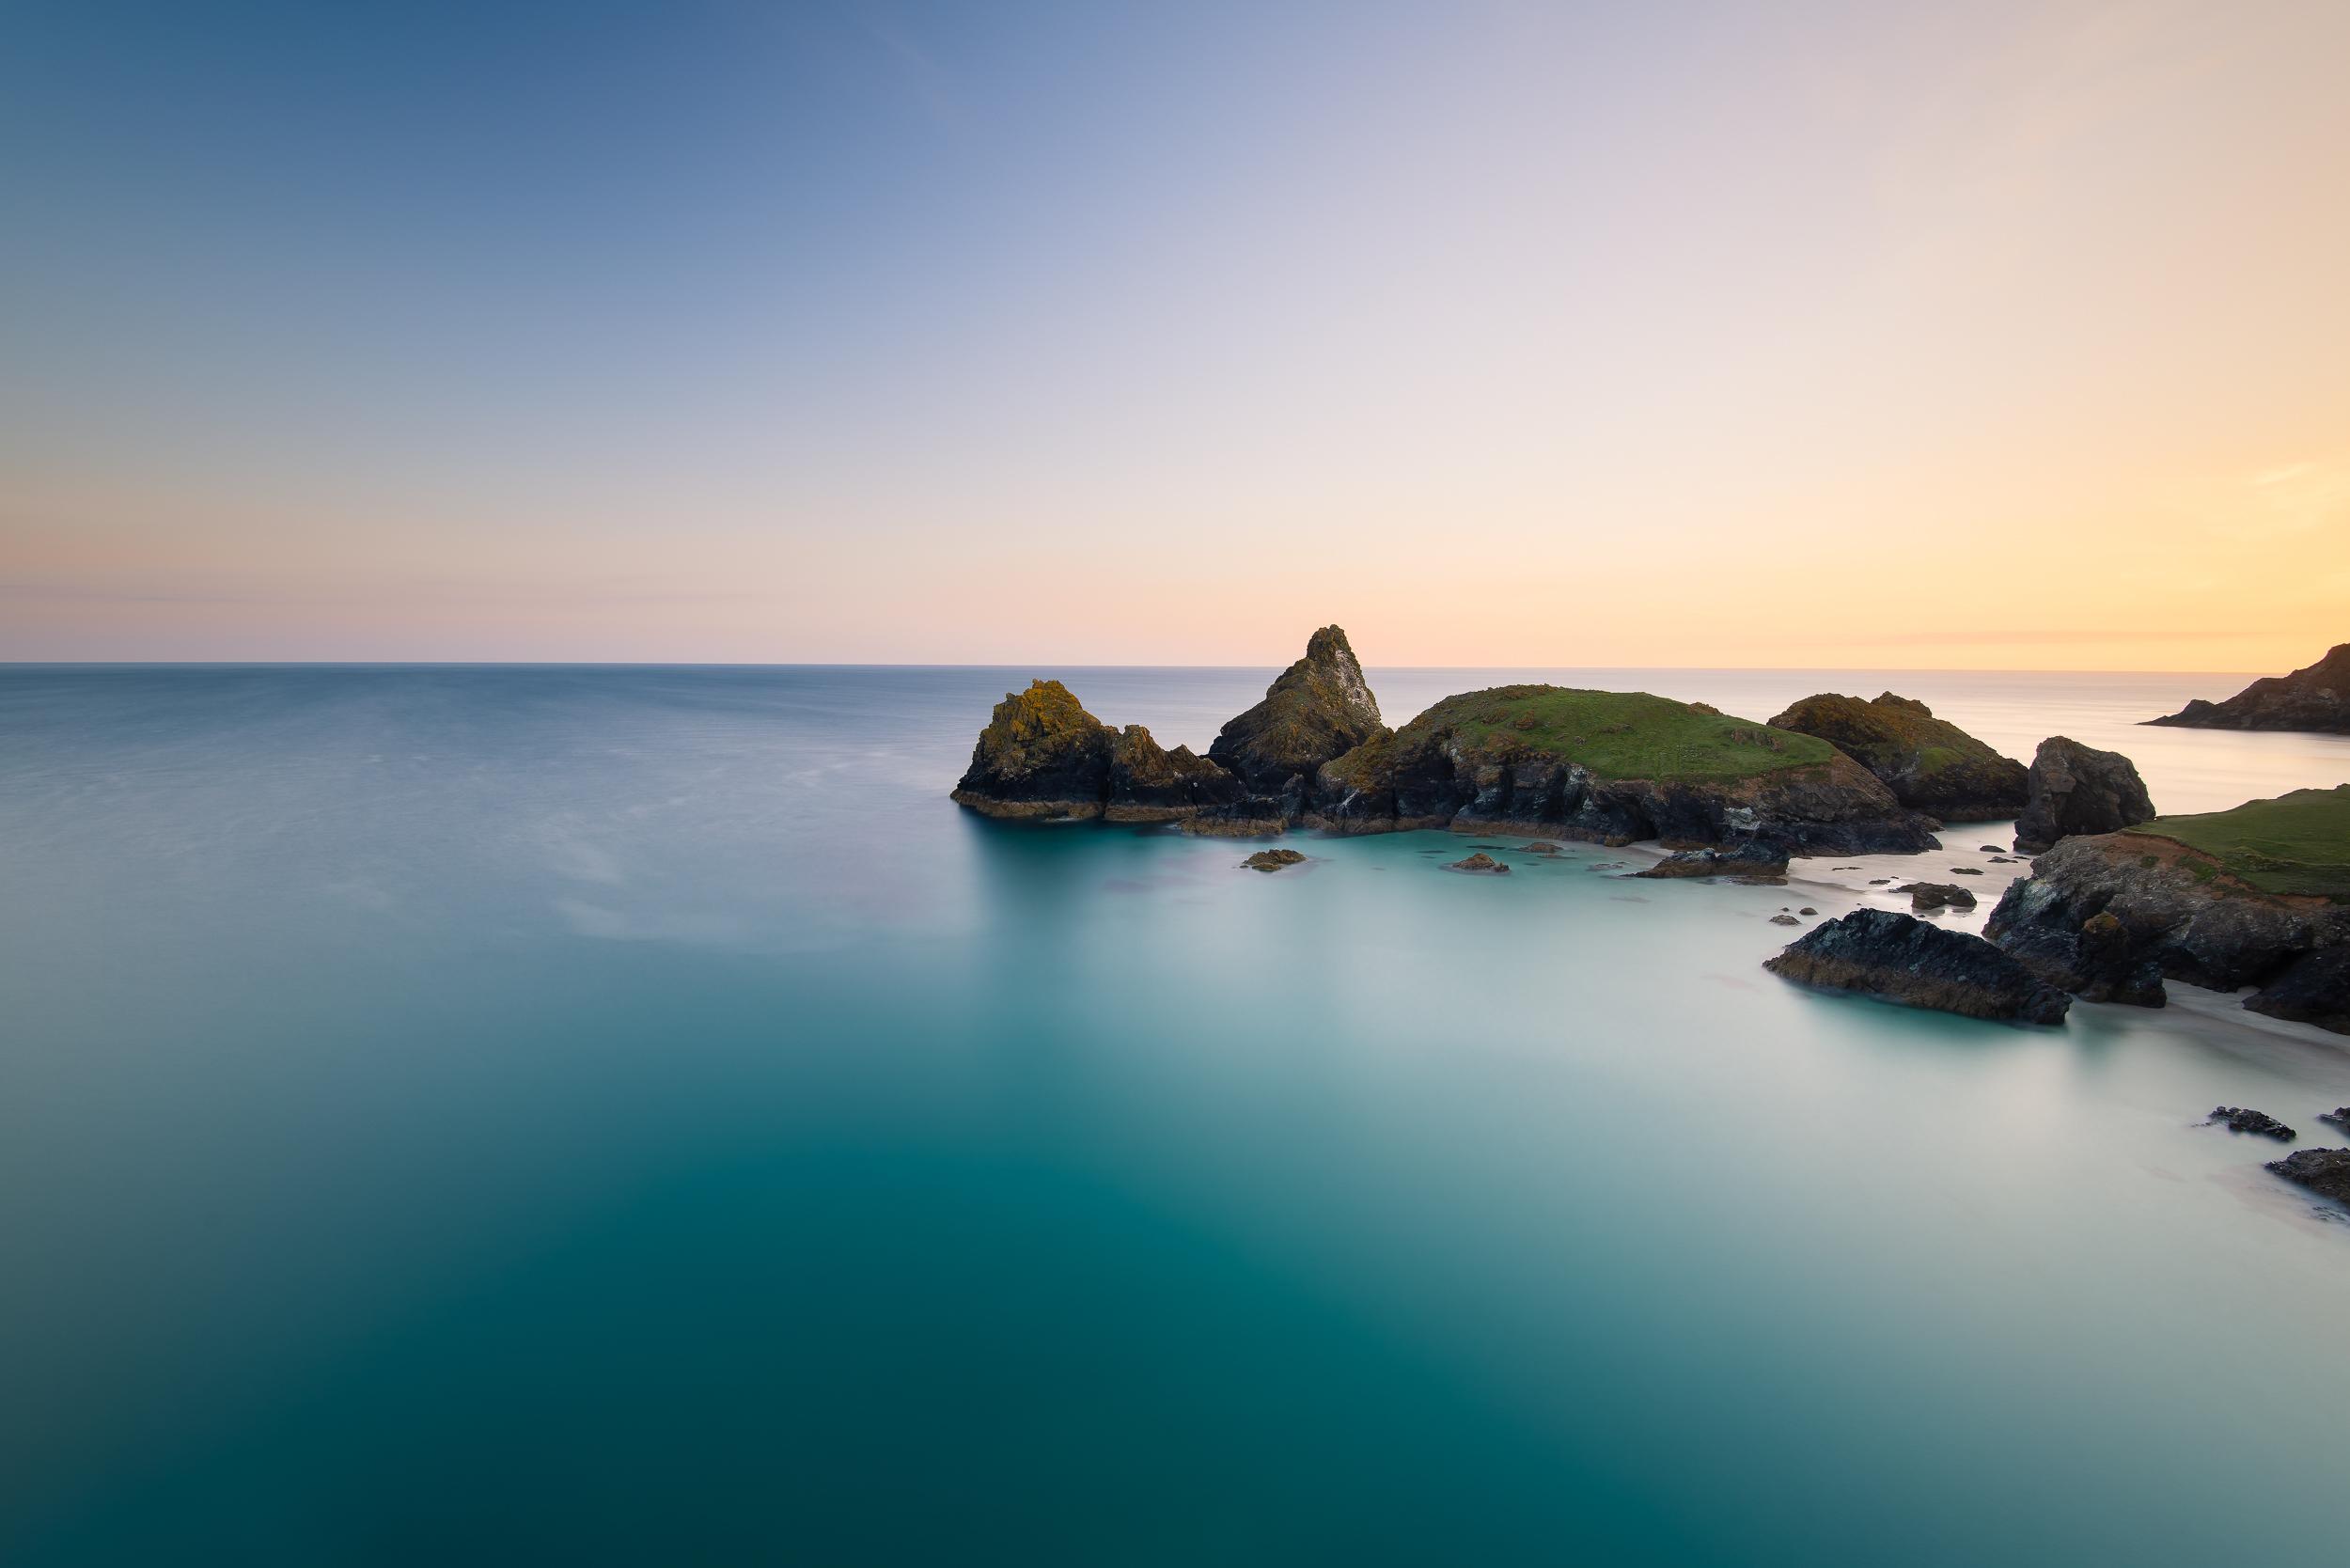 kynance-sea-islands-summer.jpg